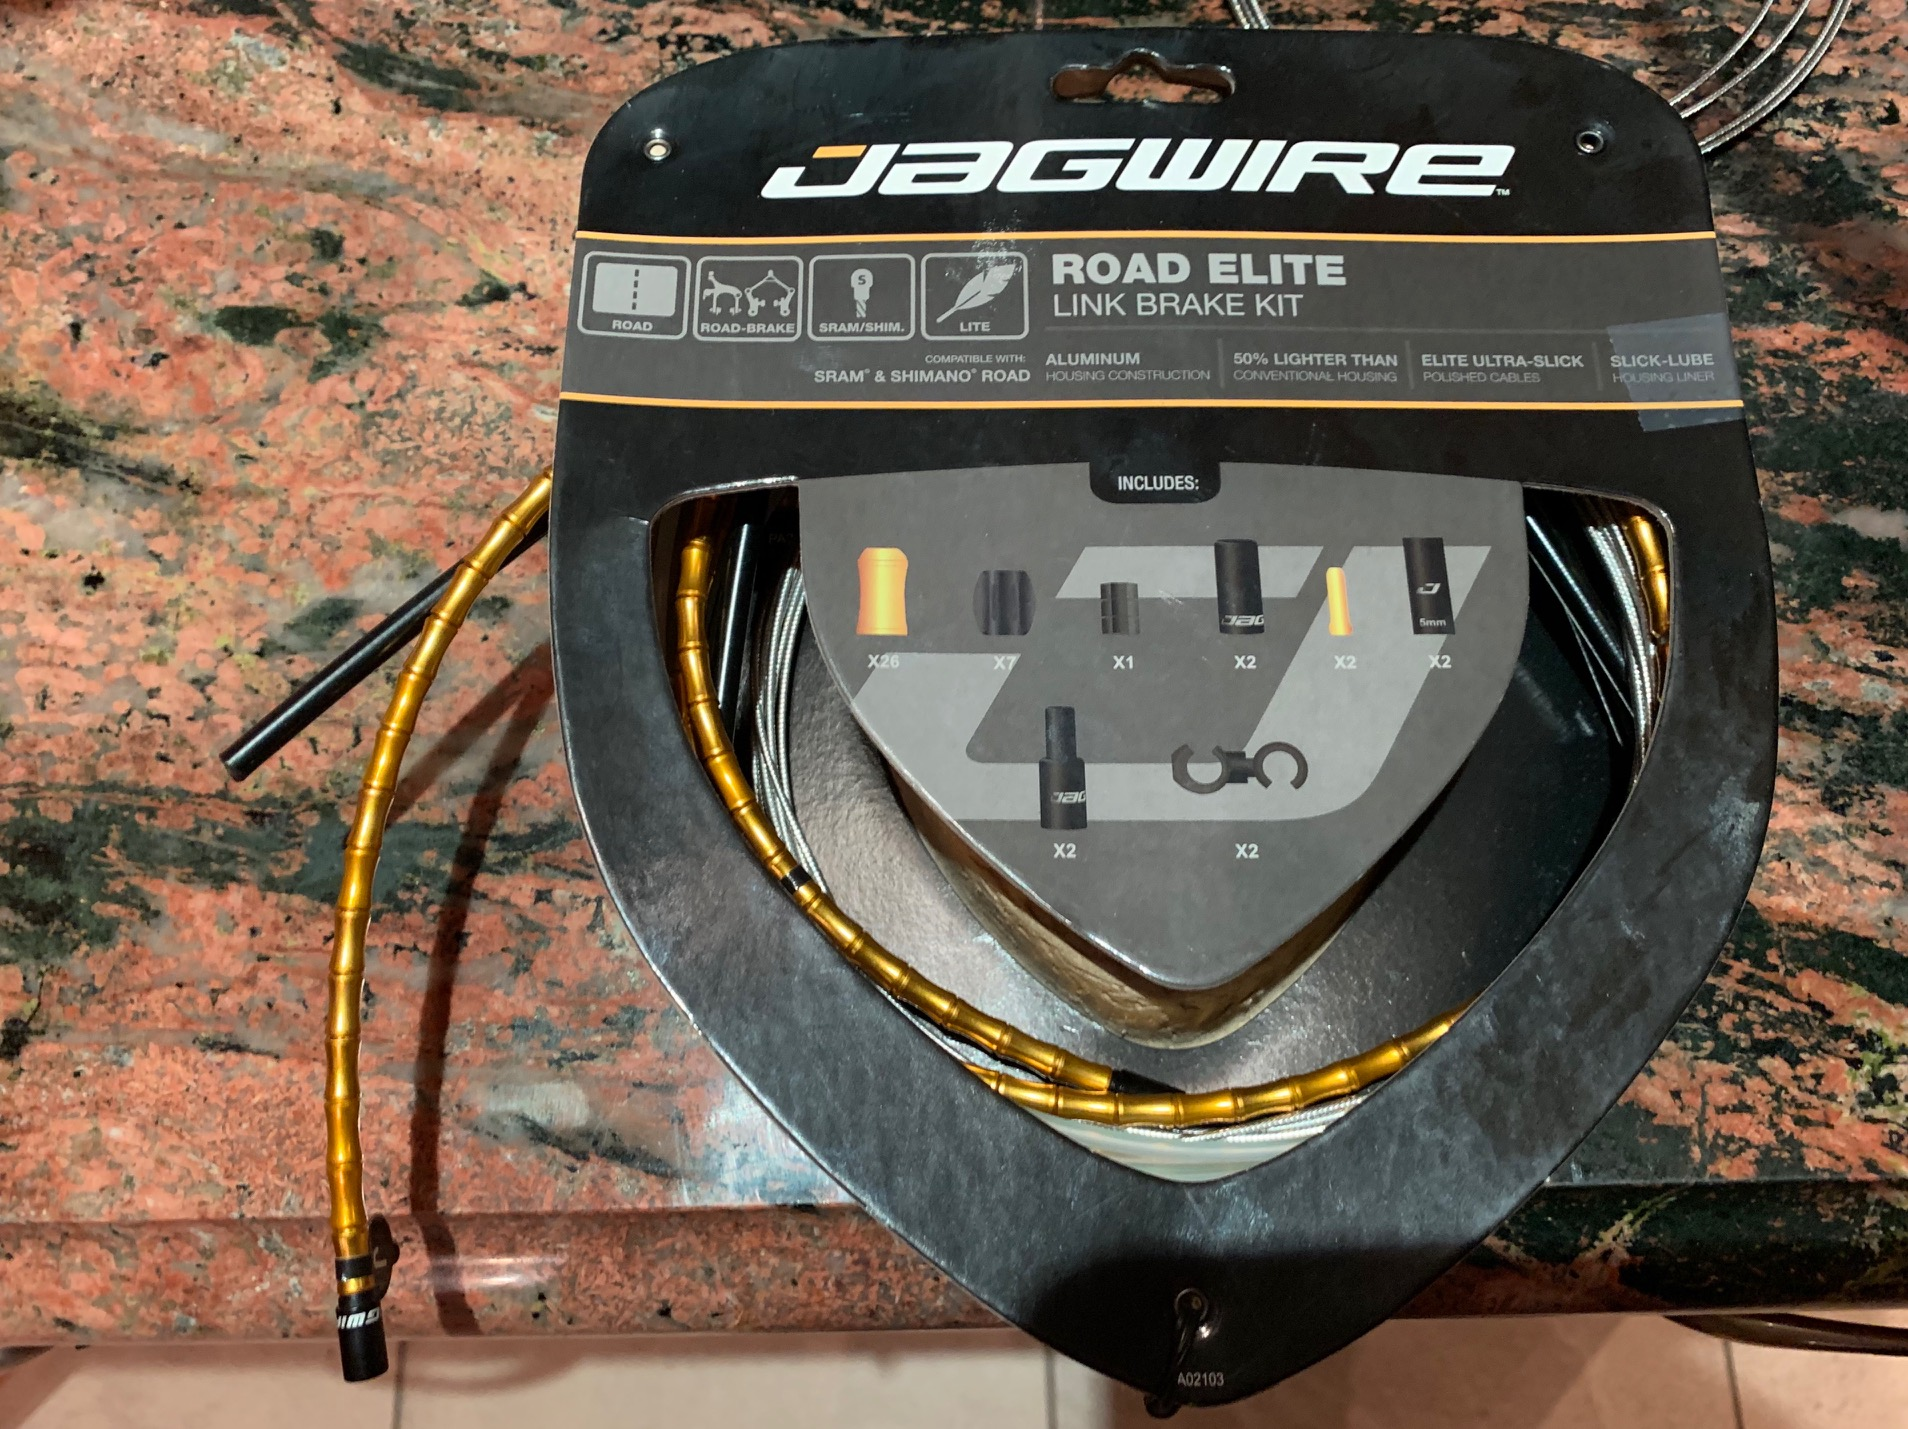 Jagwire Road Elite Link Brake Kit.jpeg